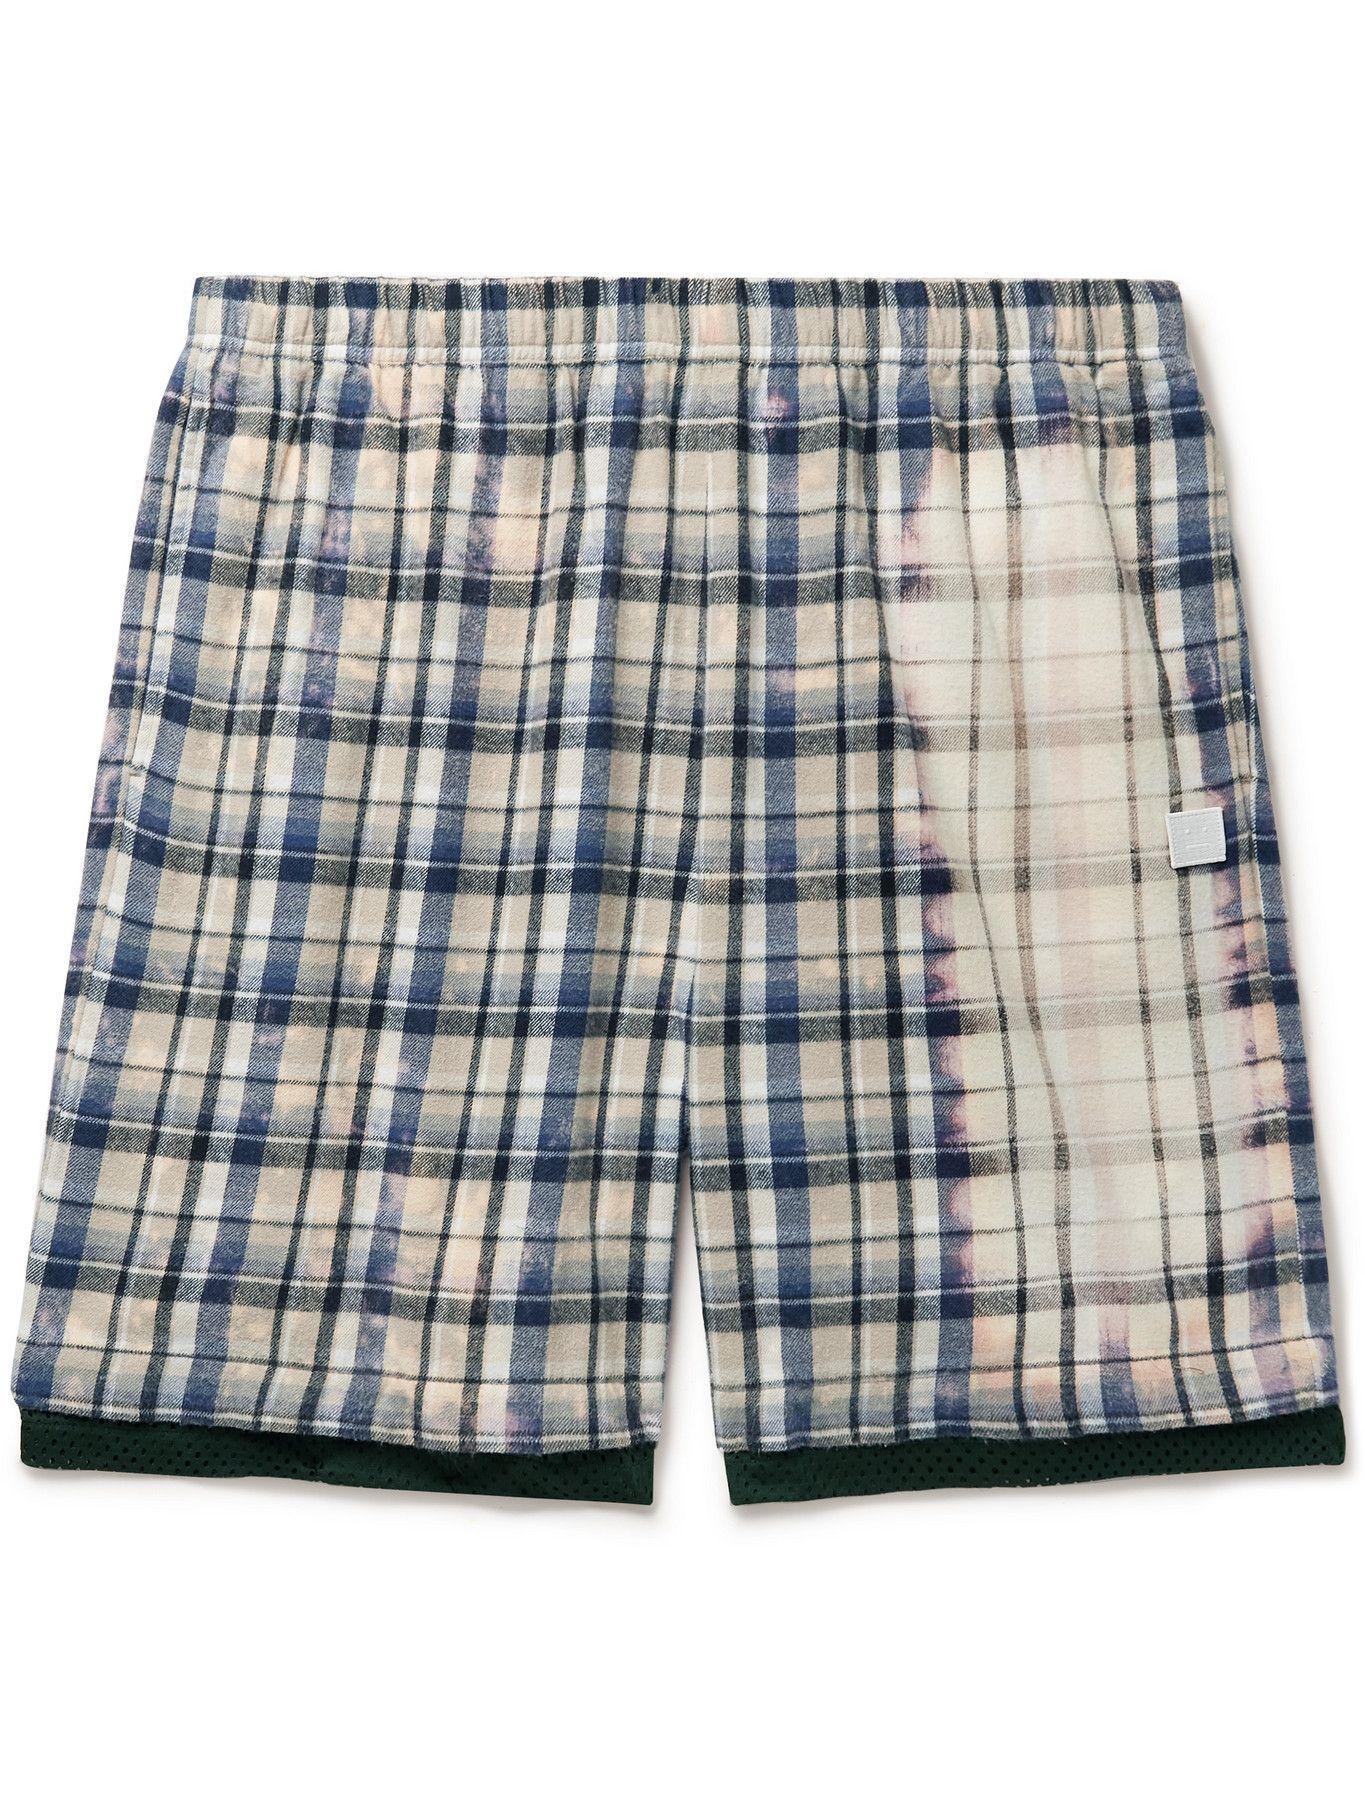 Photo: ACNE STUDIOS - Logo-Appliquéd Bleached Checked Cotton-Flannel Shorts - Multi